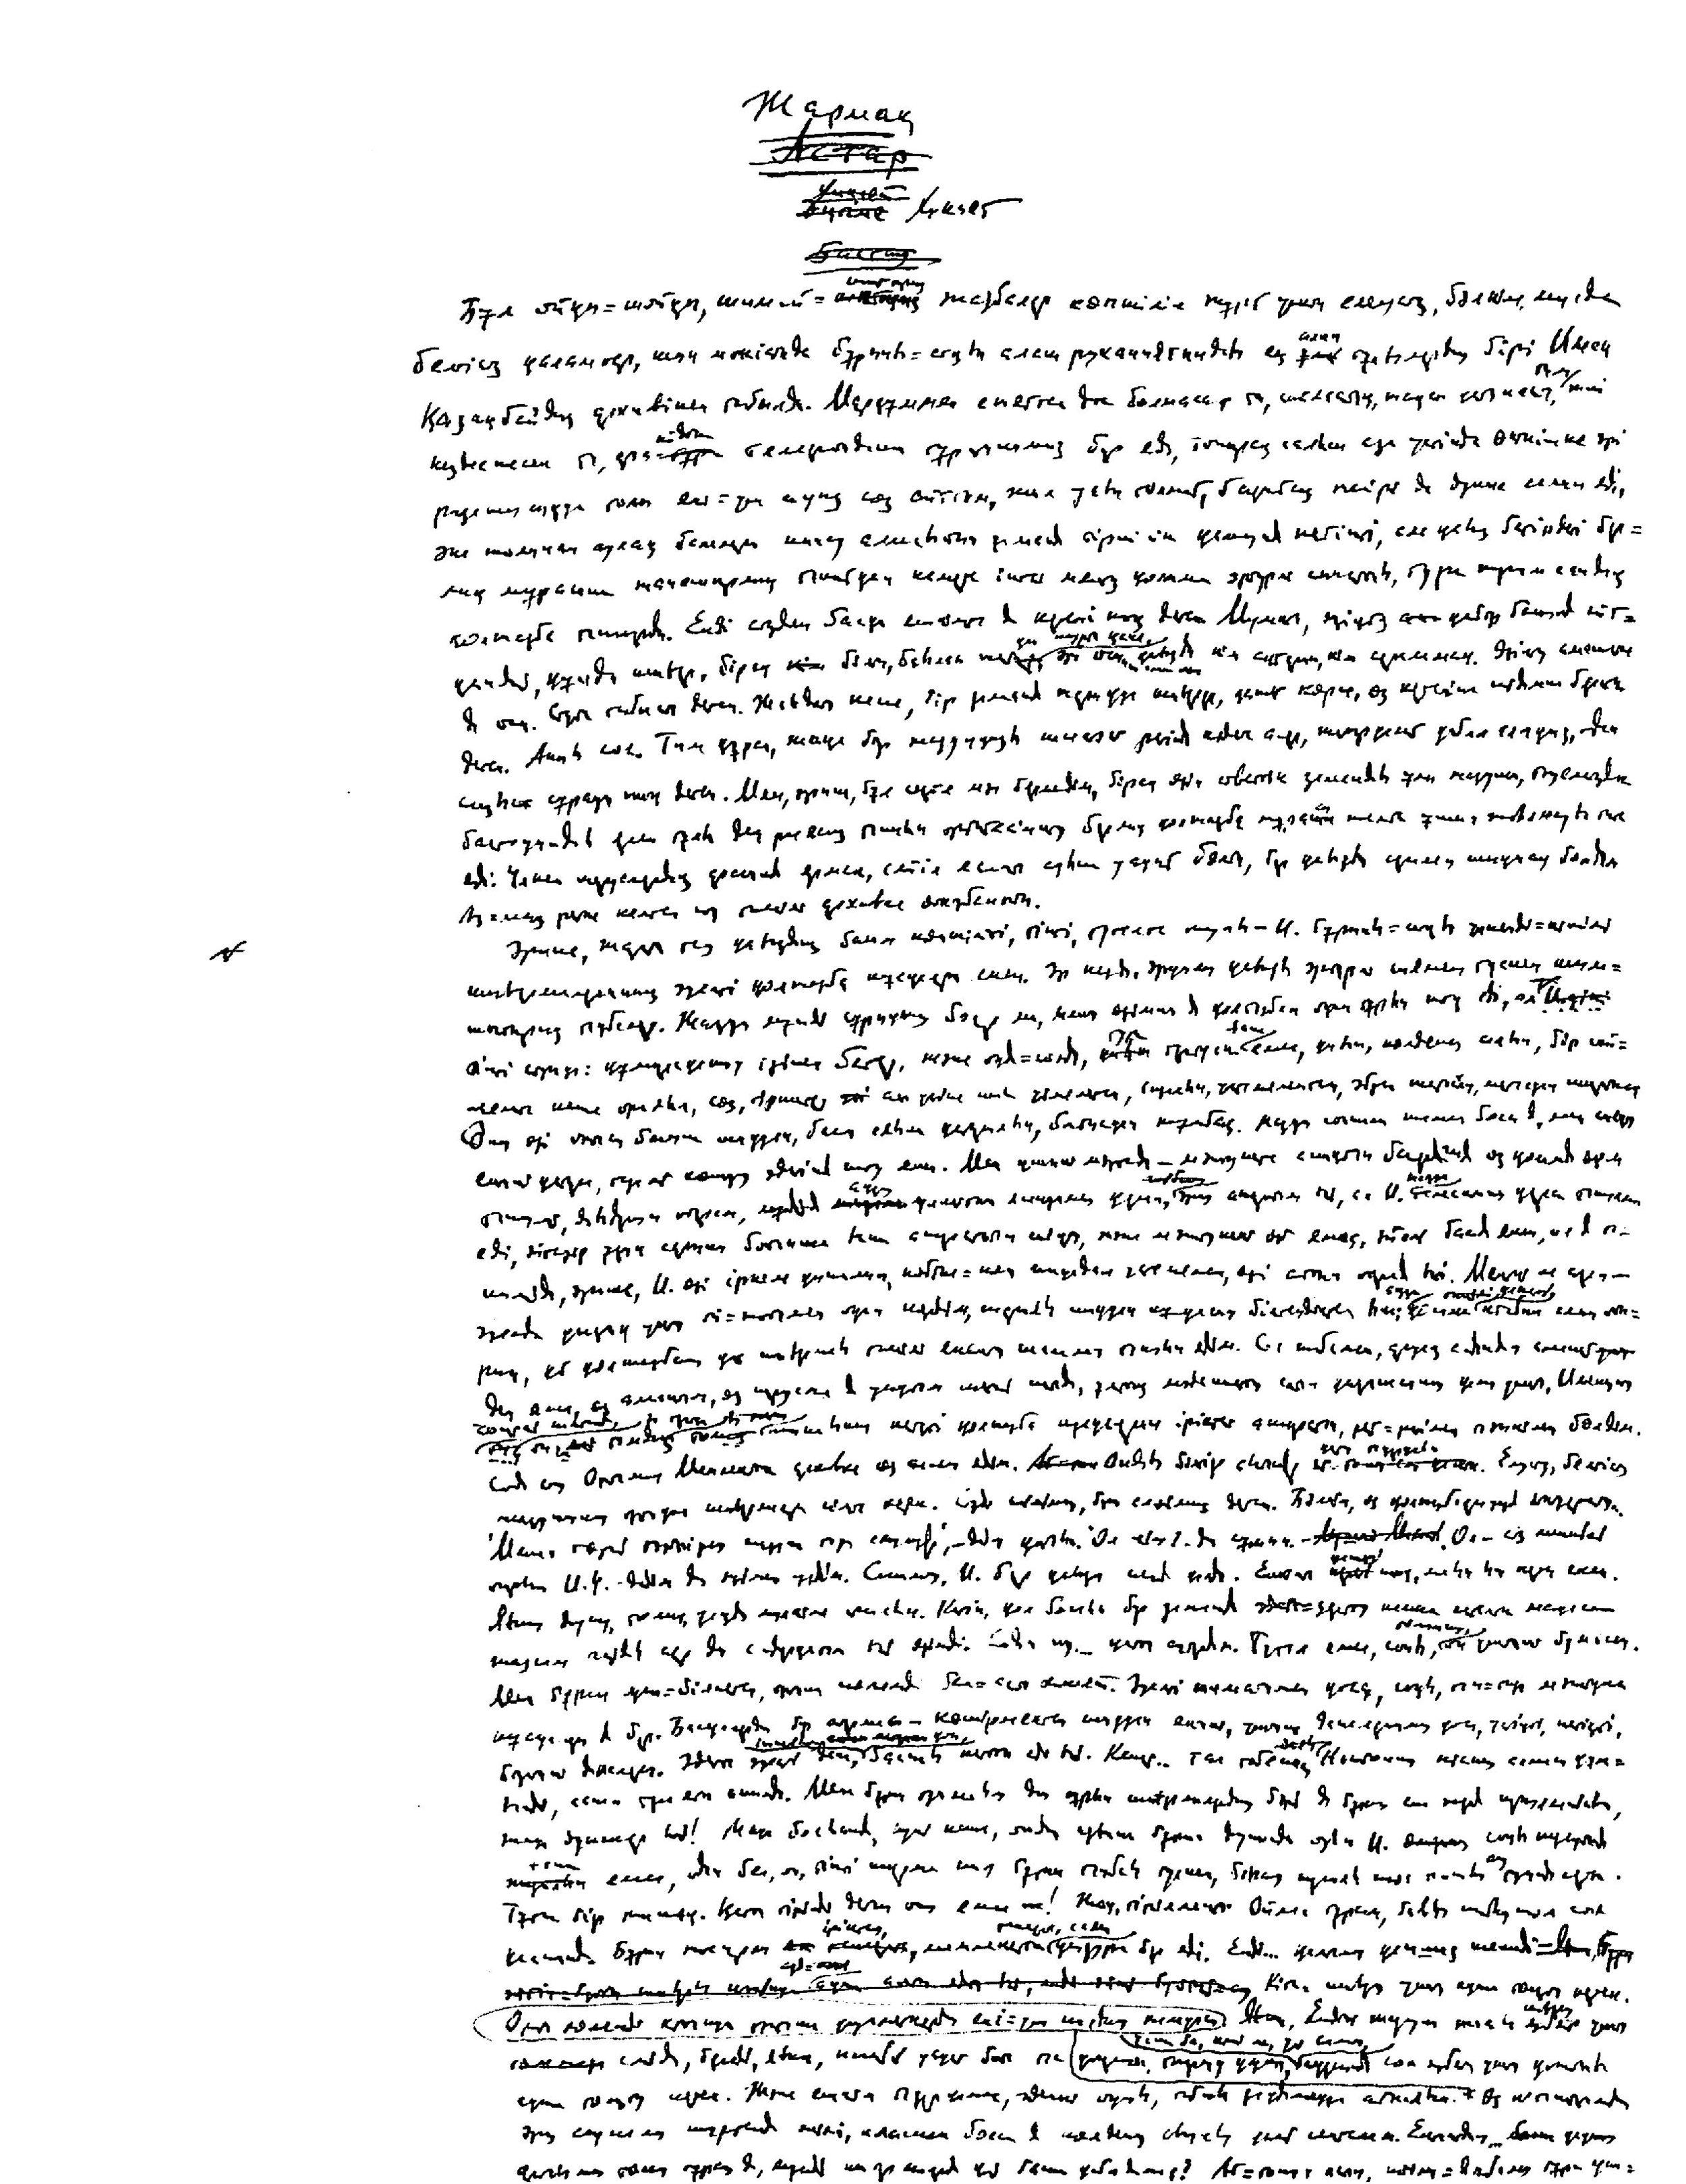 Manuscript First Draft.jpeg